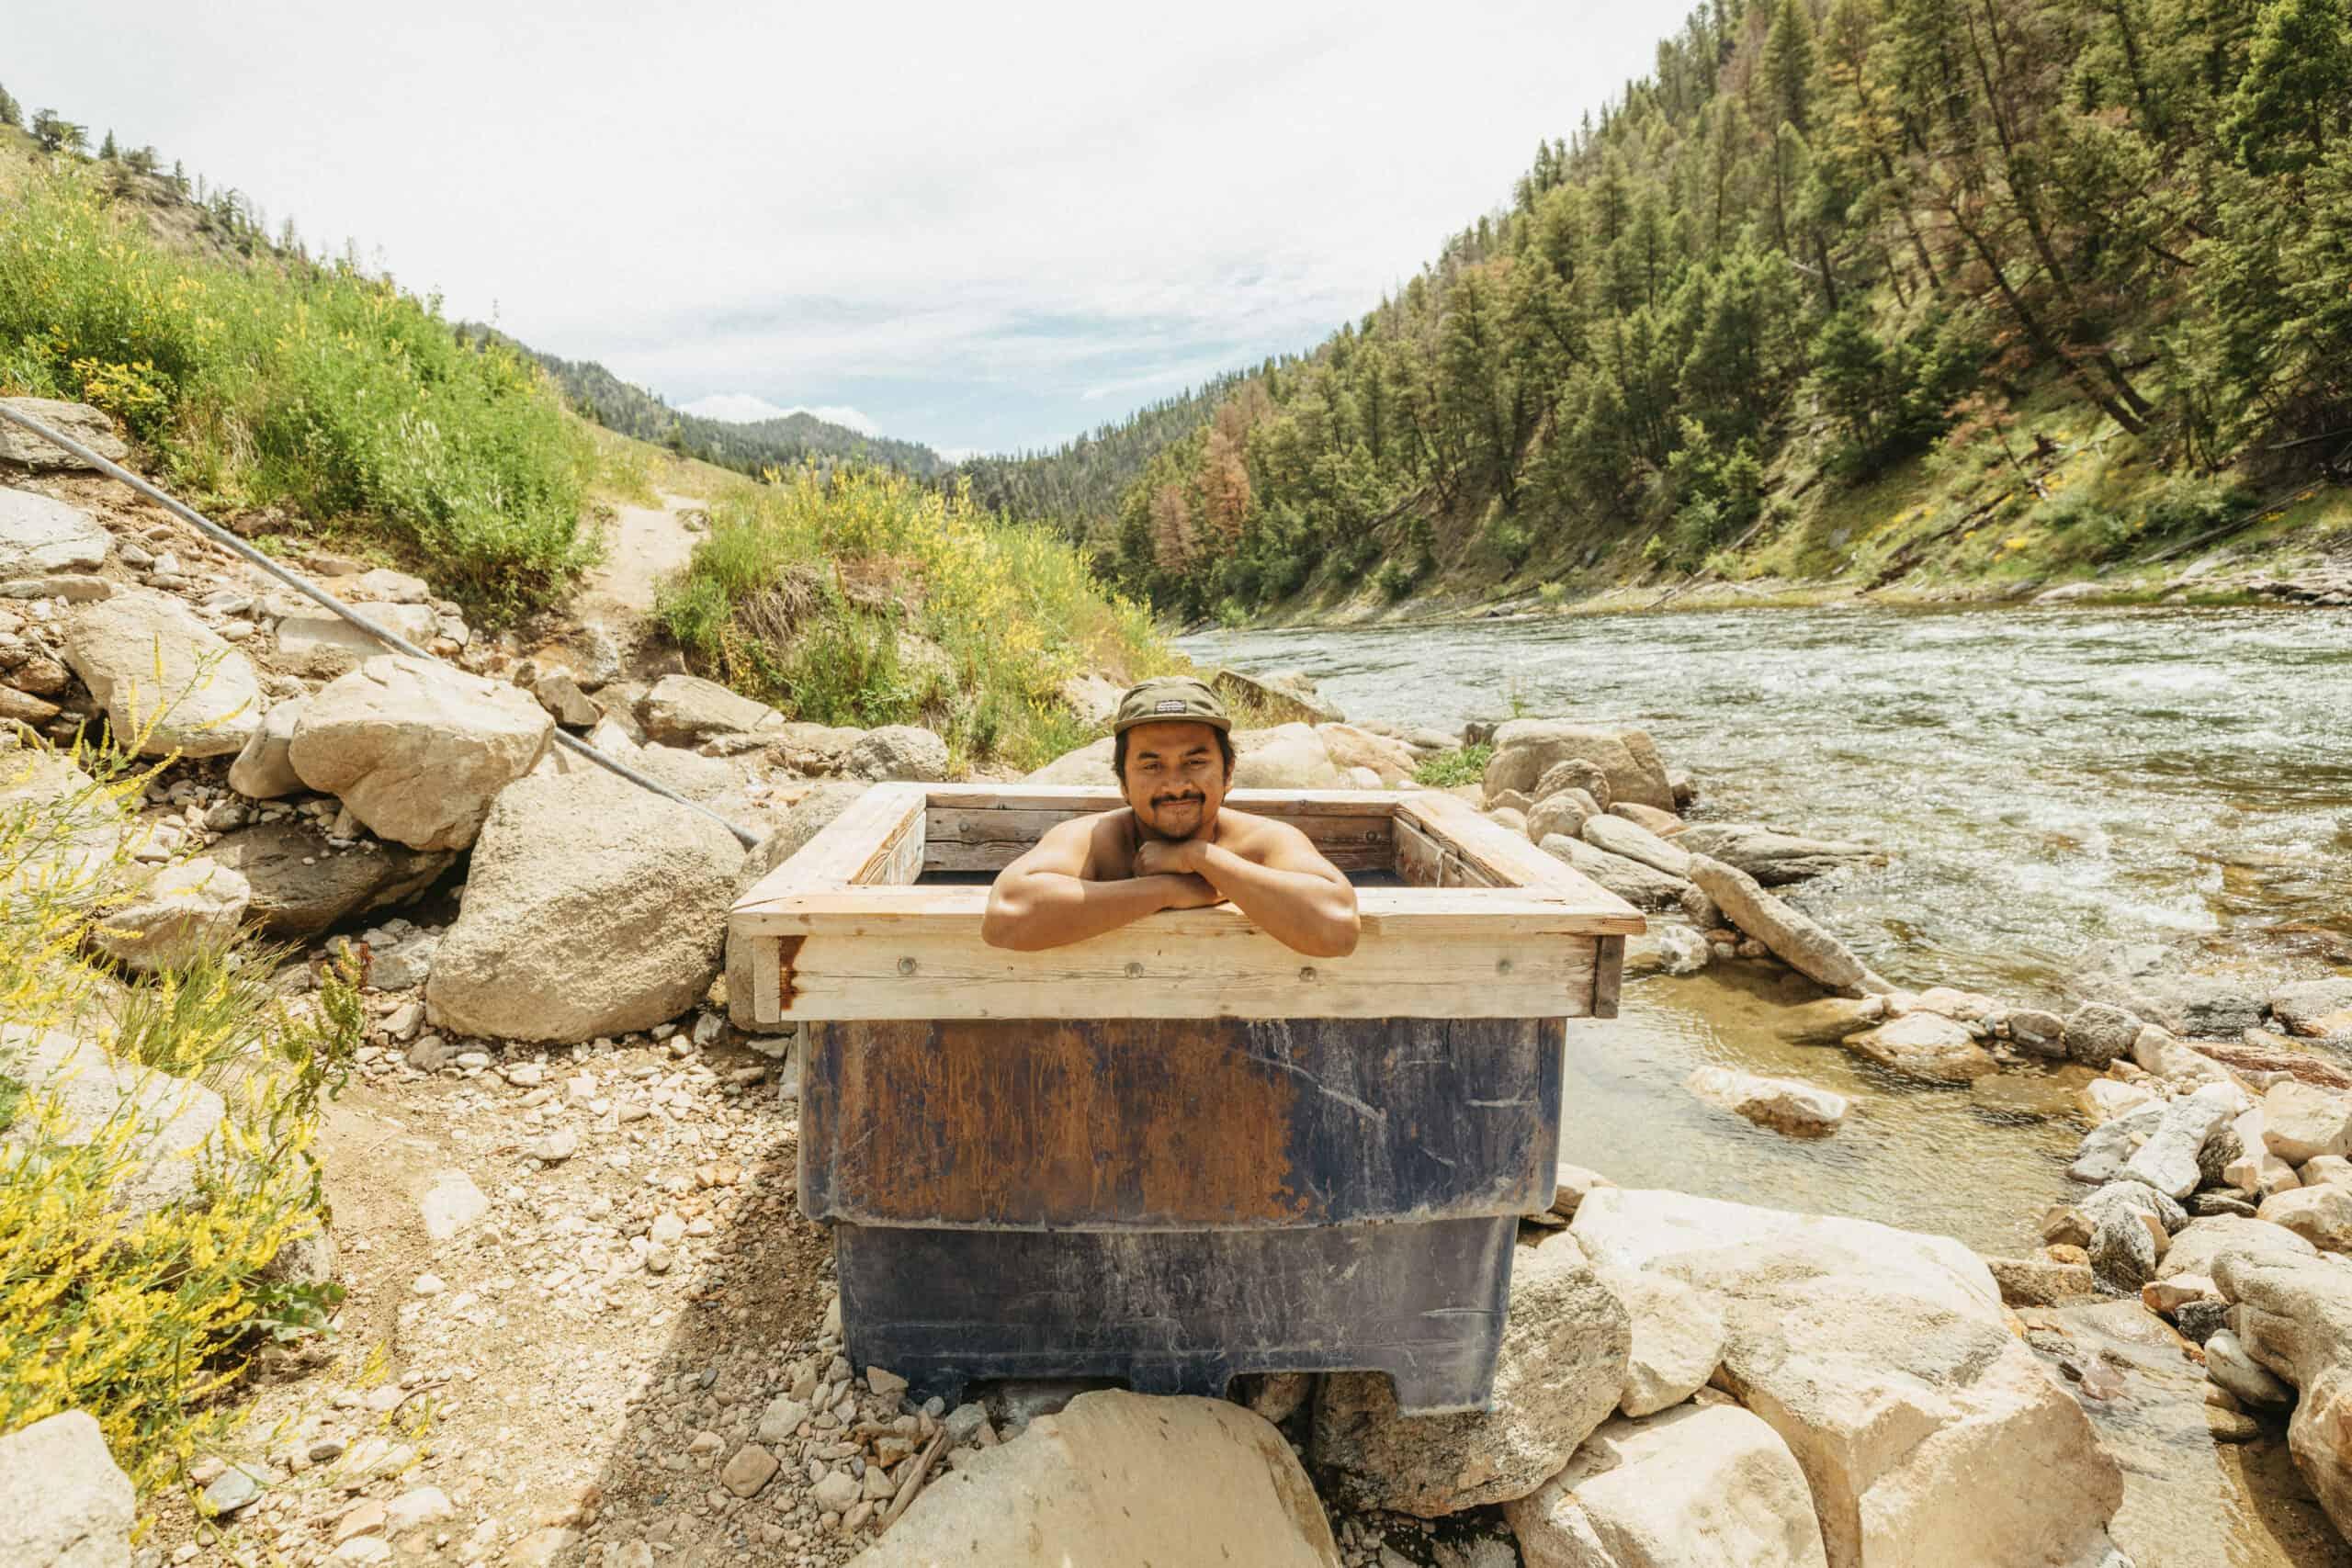 How To Reach Sunbeam Hot Springs – Unwind At Natural Geothermal Pools Near Stanley, Idaho